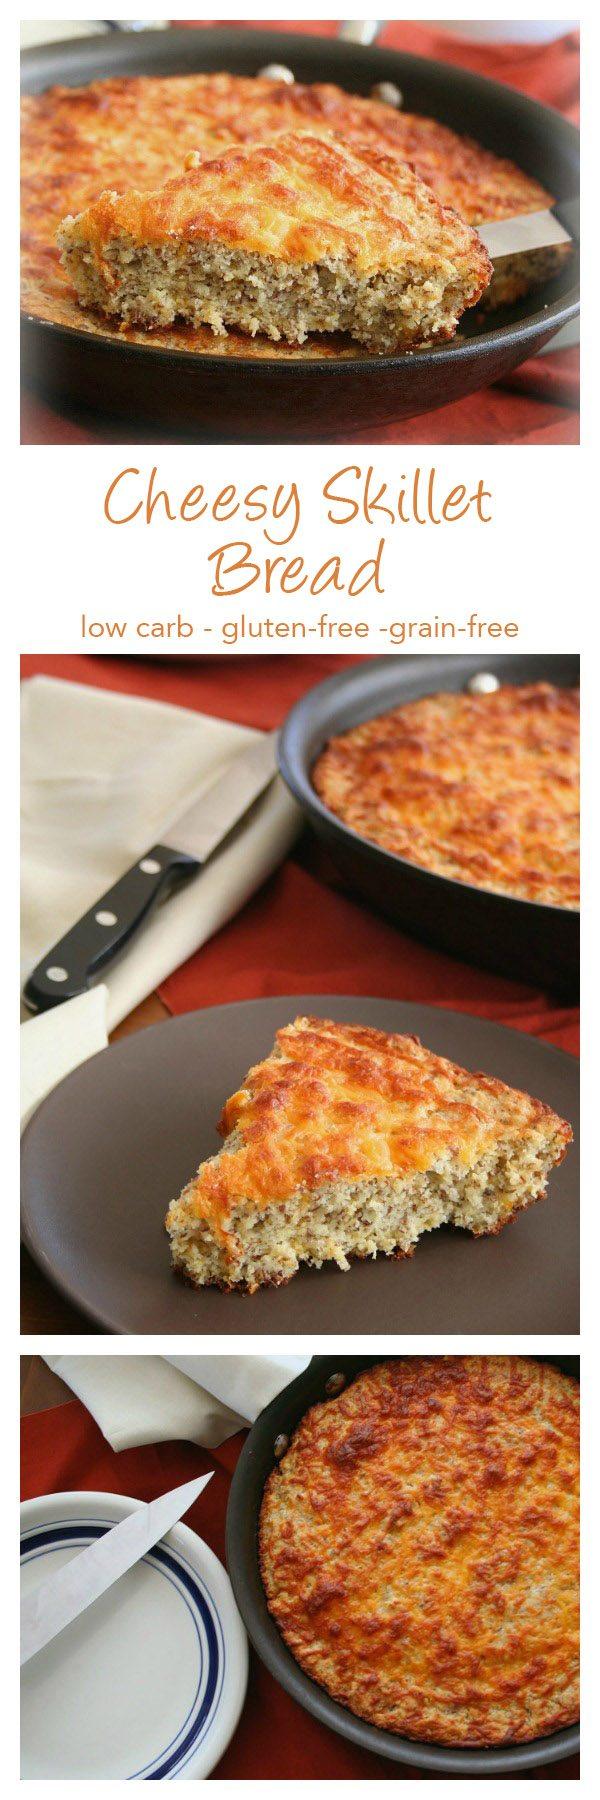 Low Carb Skillet Bread Recipe